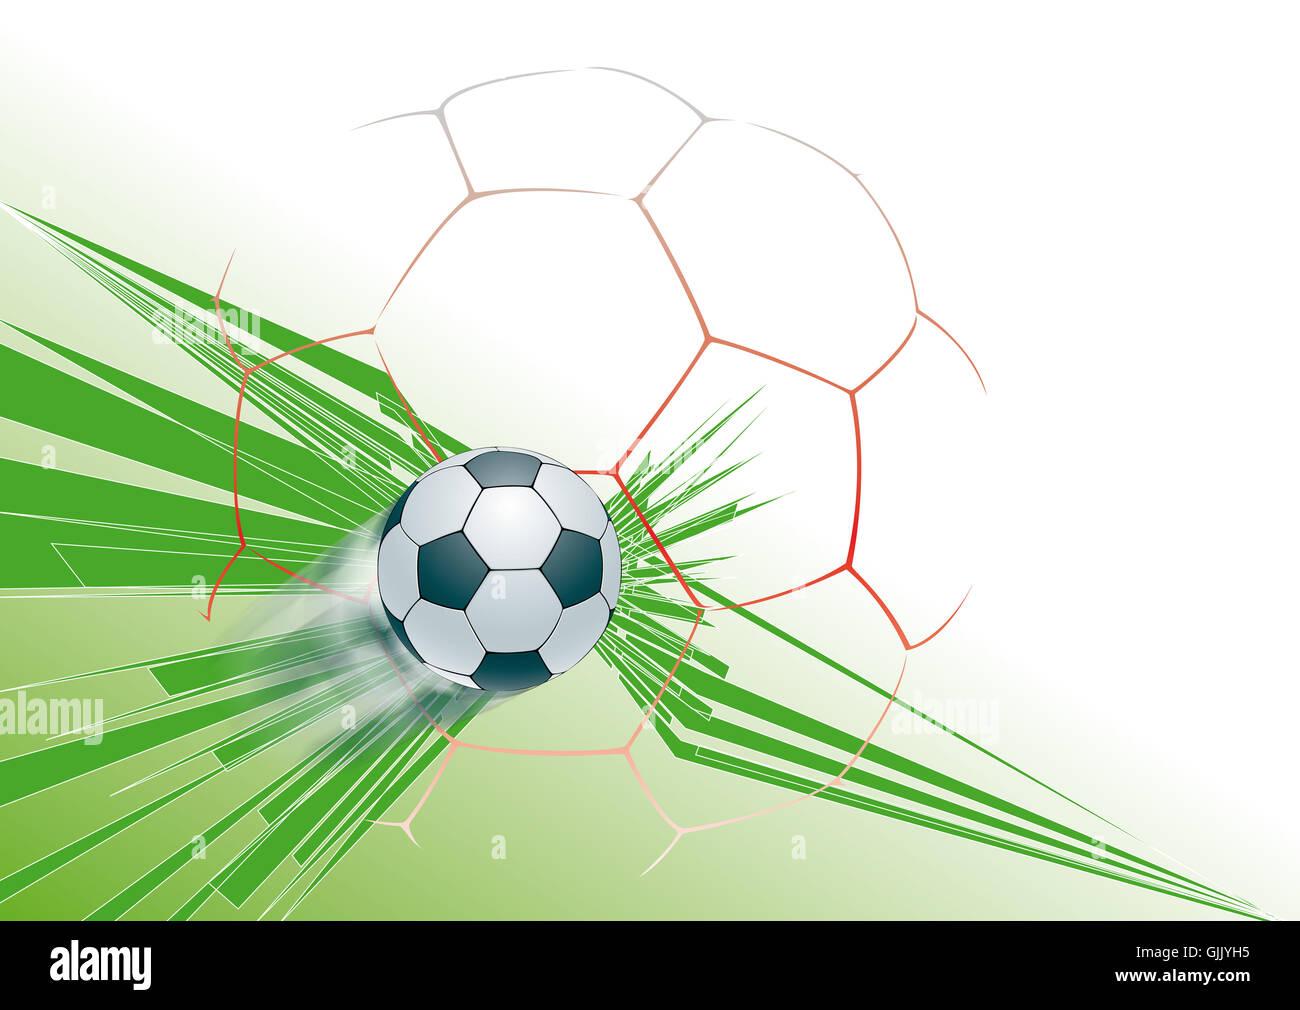 football background - Stock Image